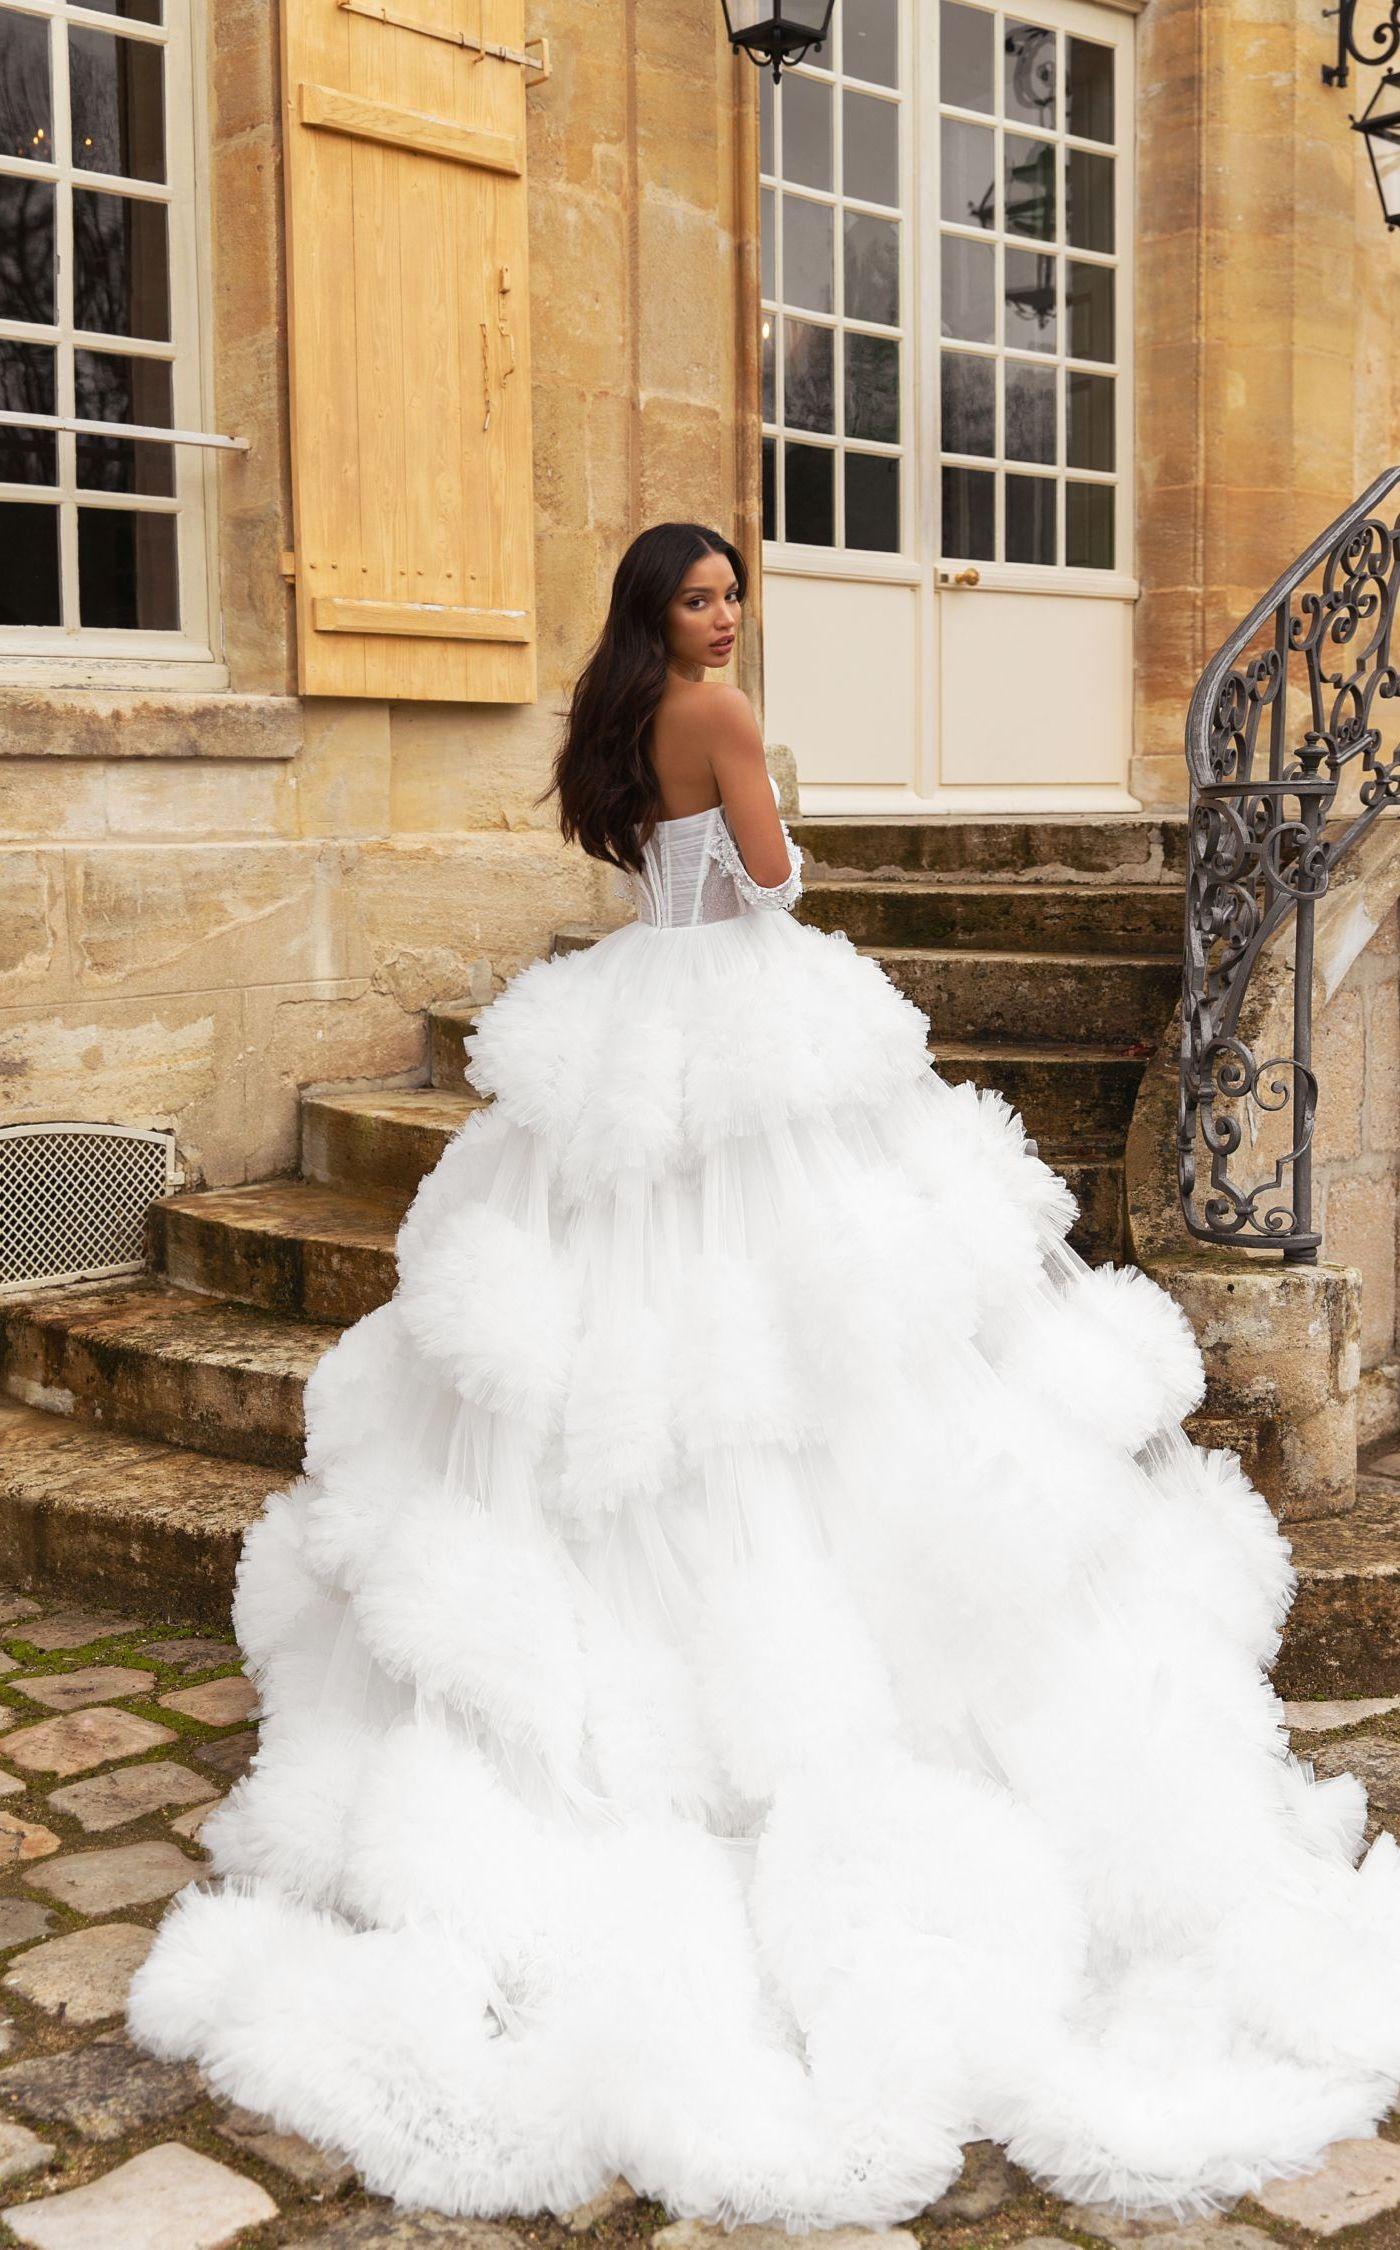 Wedding Dress 3199 Royalty New Collection Wedding Dresses Pollardi In 2020 Elegant Bridal Gown Beautiful Wedding Dresses Wedding Dress Trends,Printable Wedding Dress Template